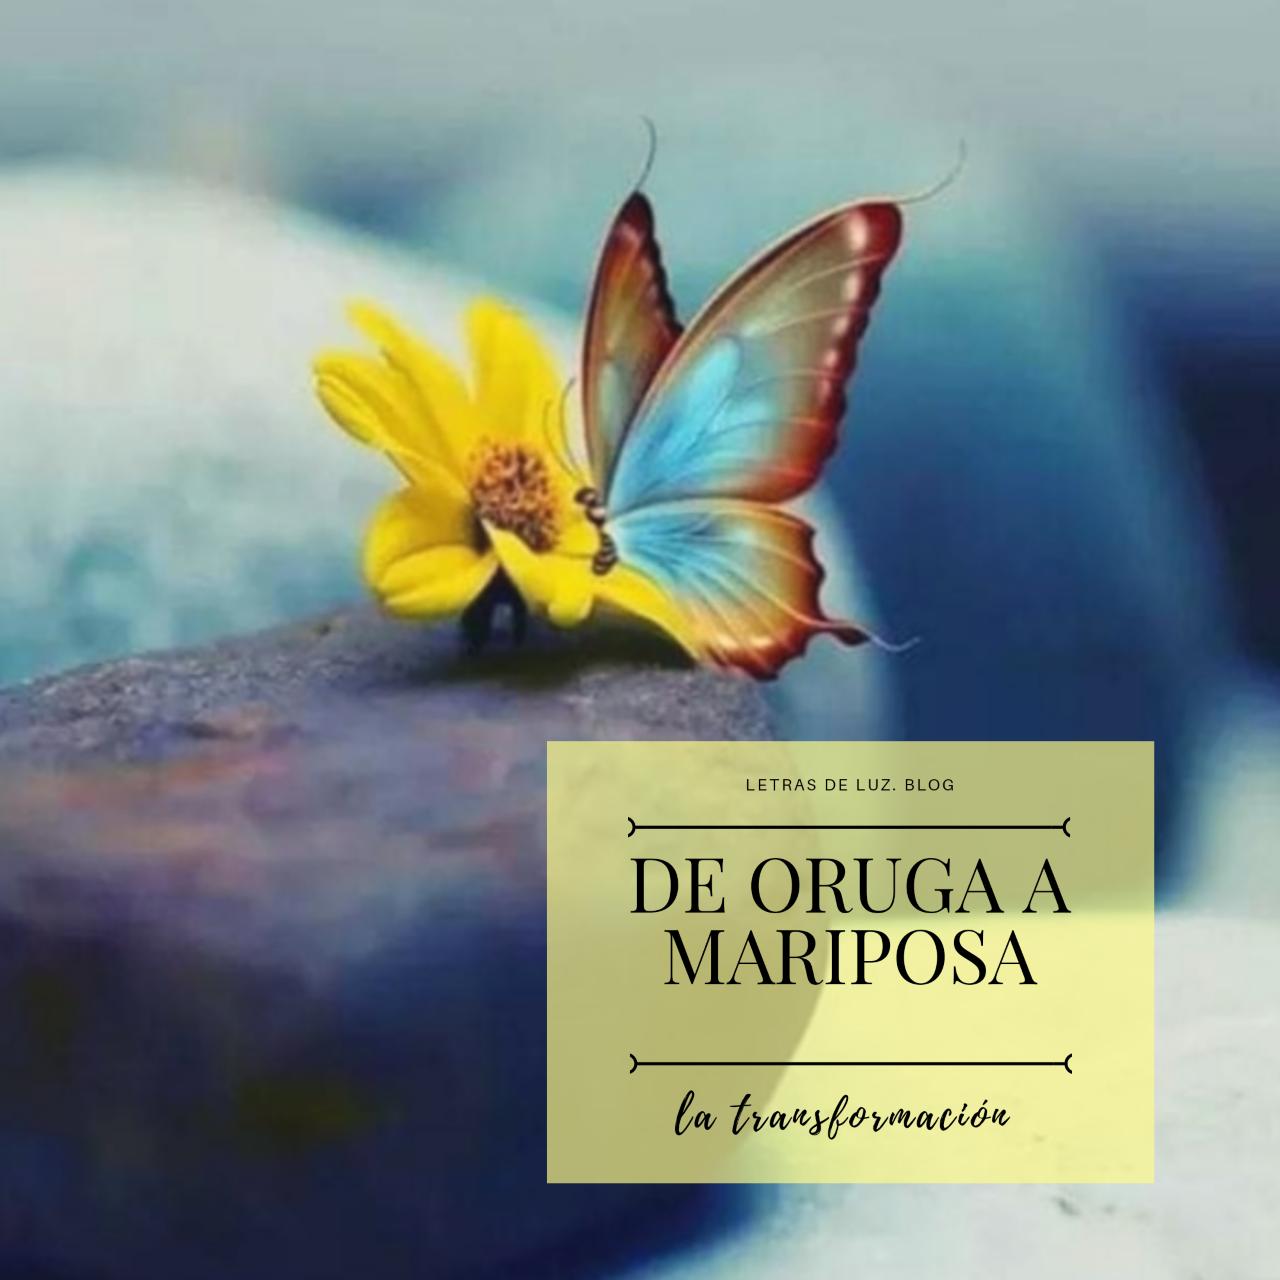 bonita mariposa azul con flor. Texto: de oruga a mariposa. La tranformación.